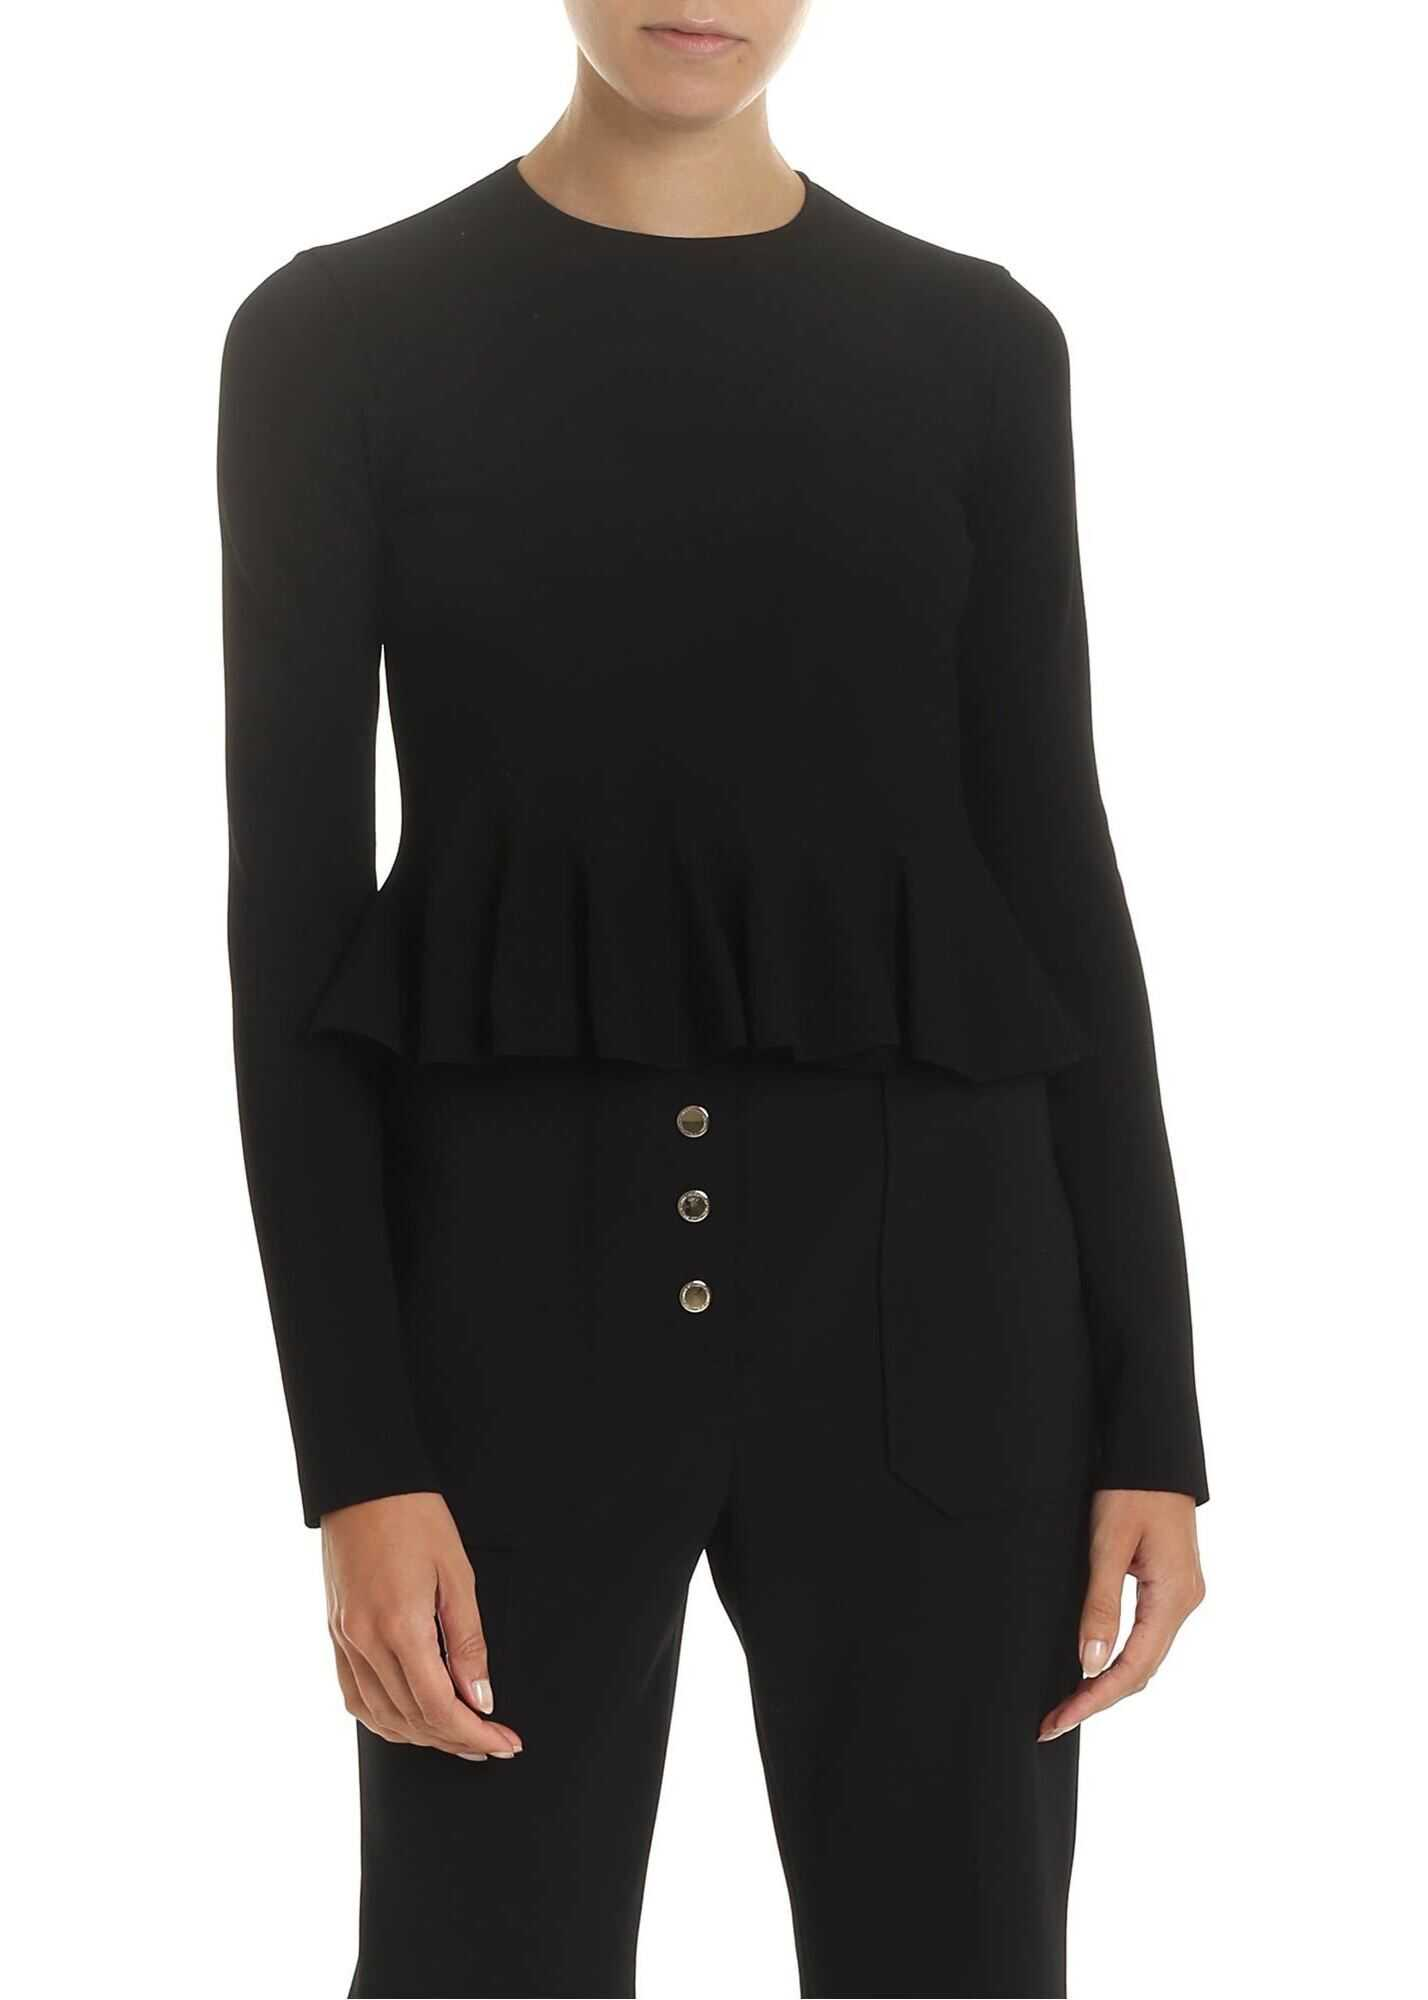 adidas by Stella McCartney Flared Crop Shirt In Black With Pleats Black